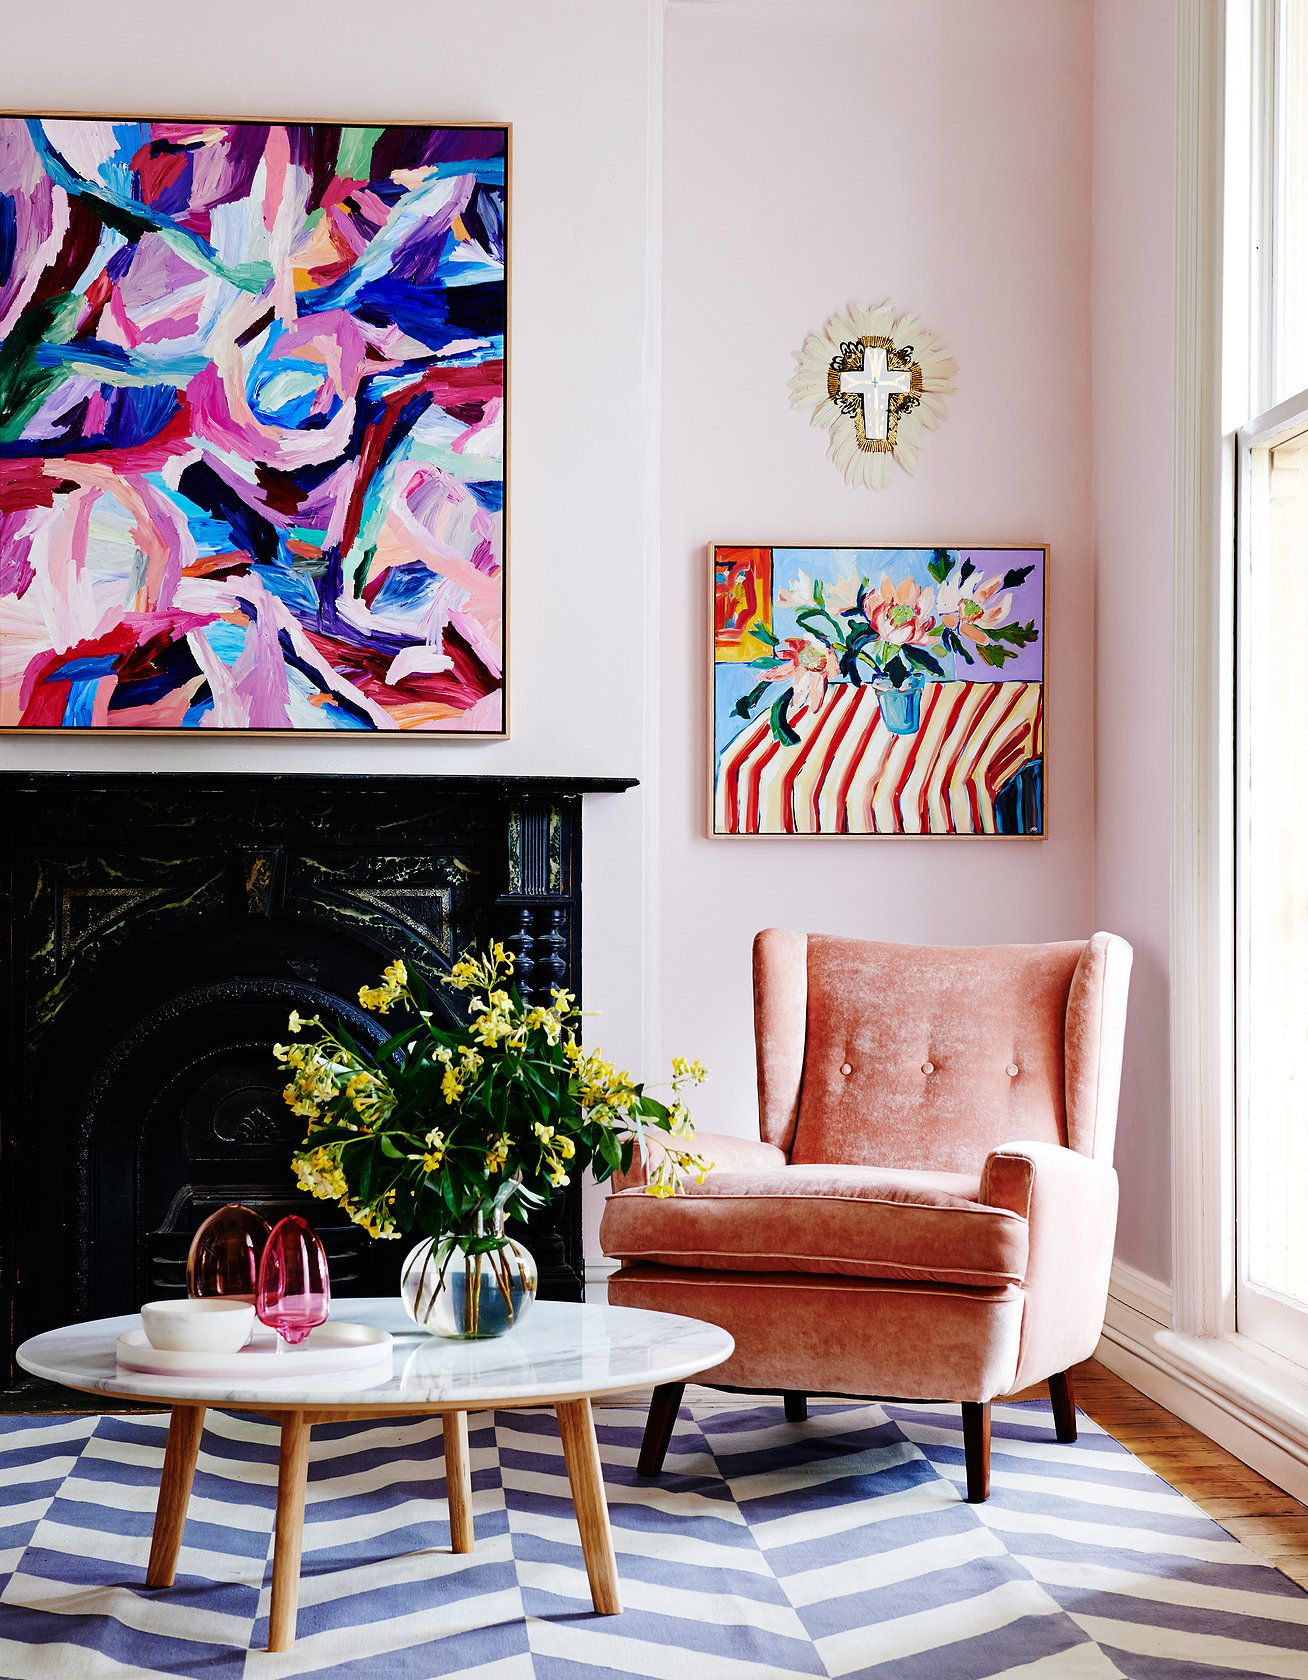 Resultado de imagem para australian paint artist helen mccullagh